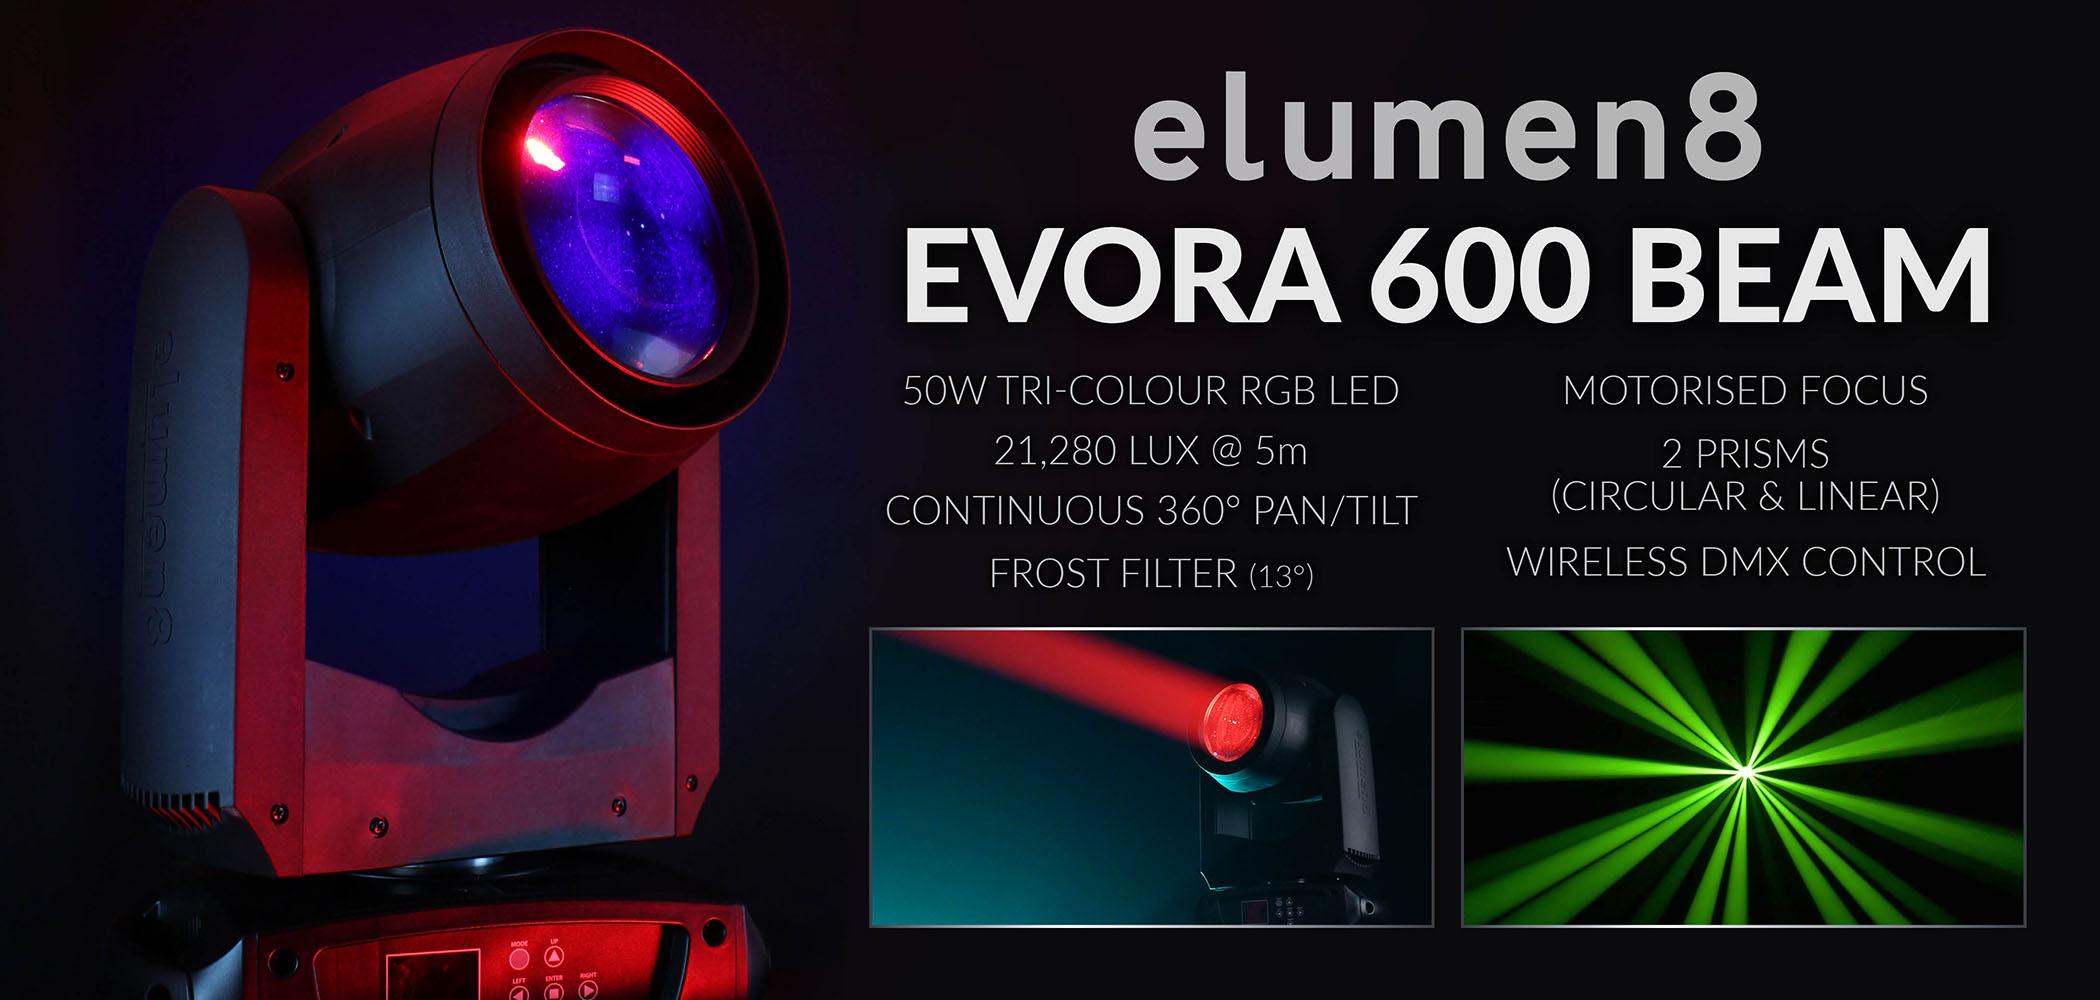 Evora 600 Beam Home Page Banner